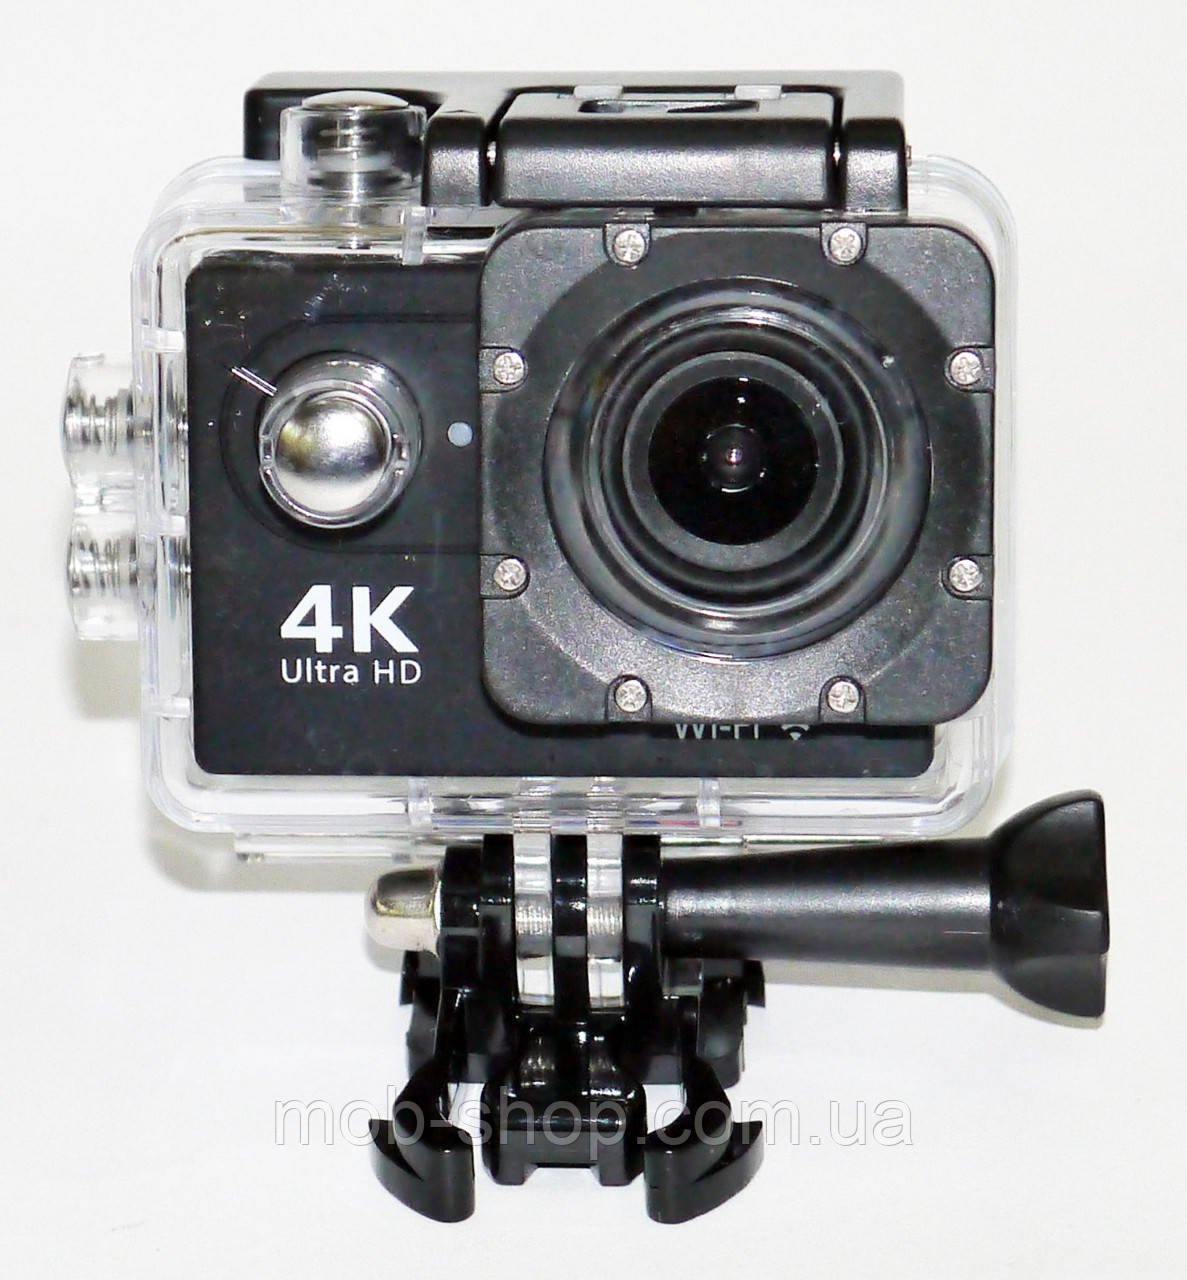 Єкшн-камера Action Camera B5 WiFi 4K